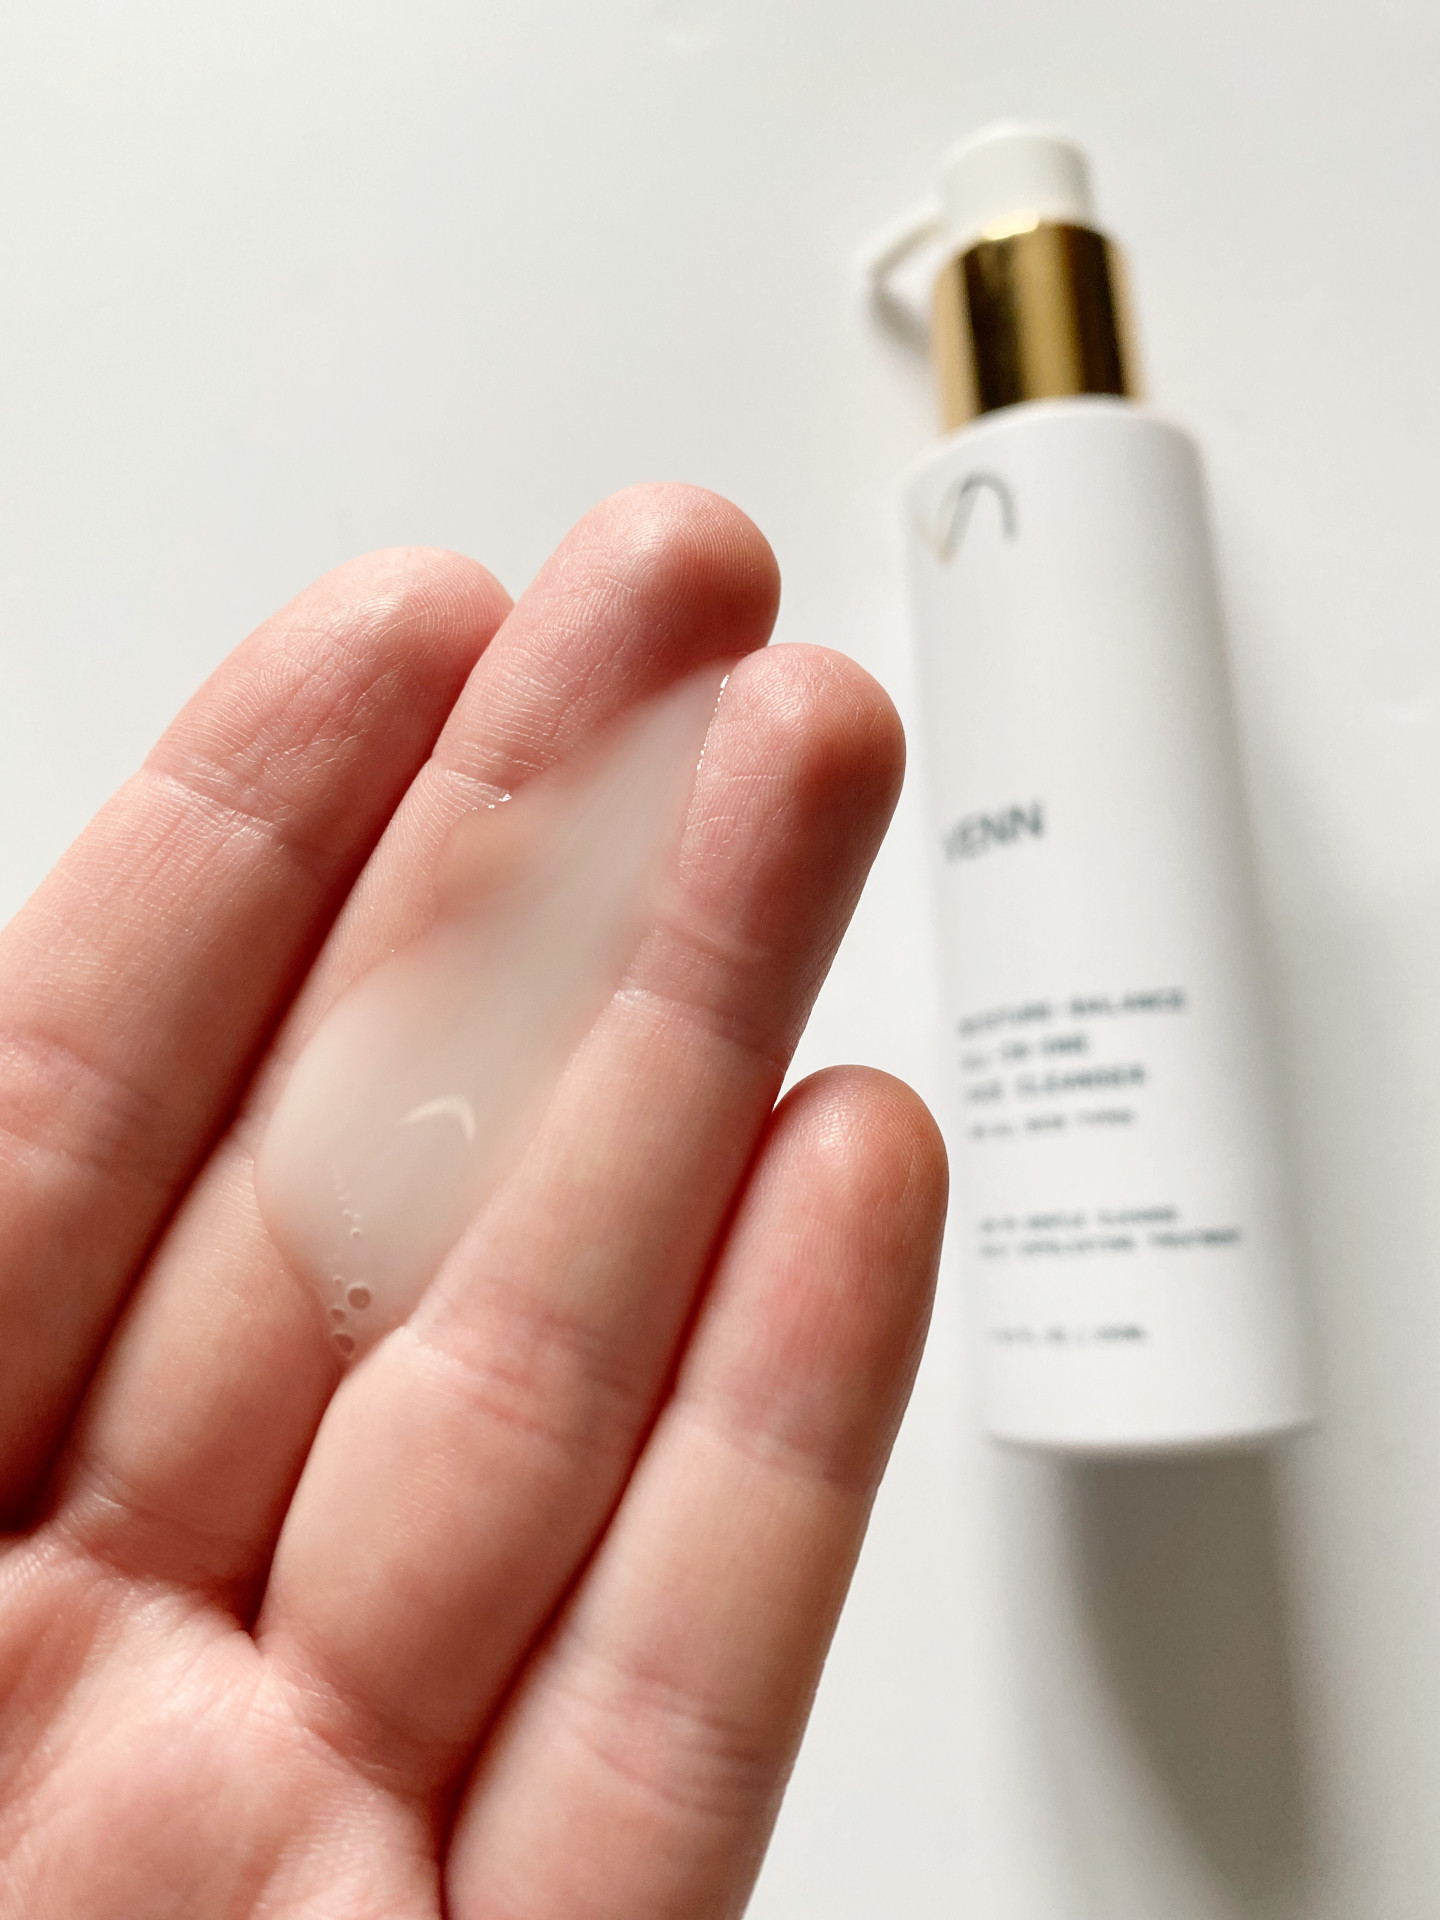 venn skincare moisture balance all in one cleanser review